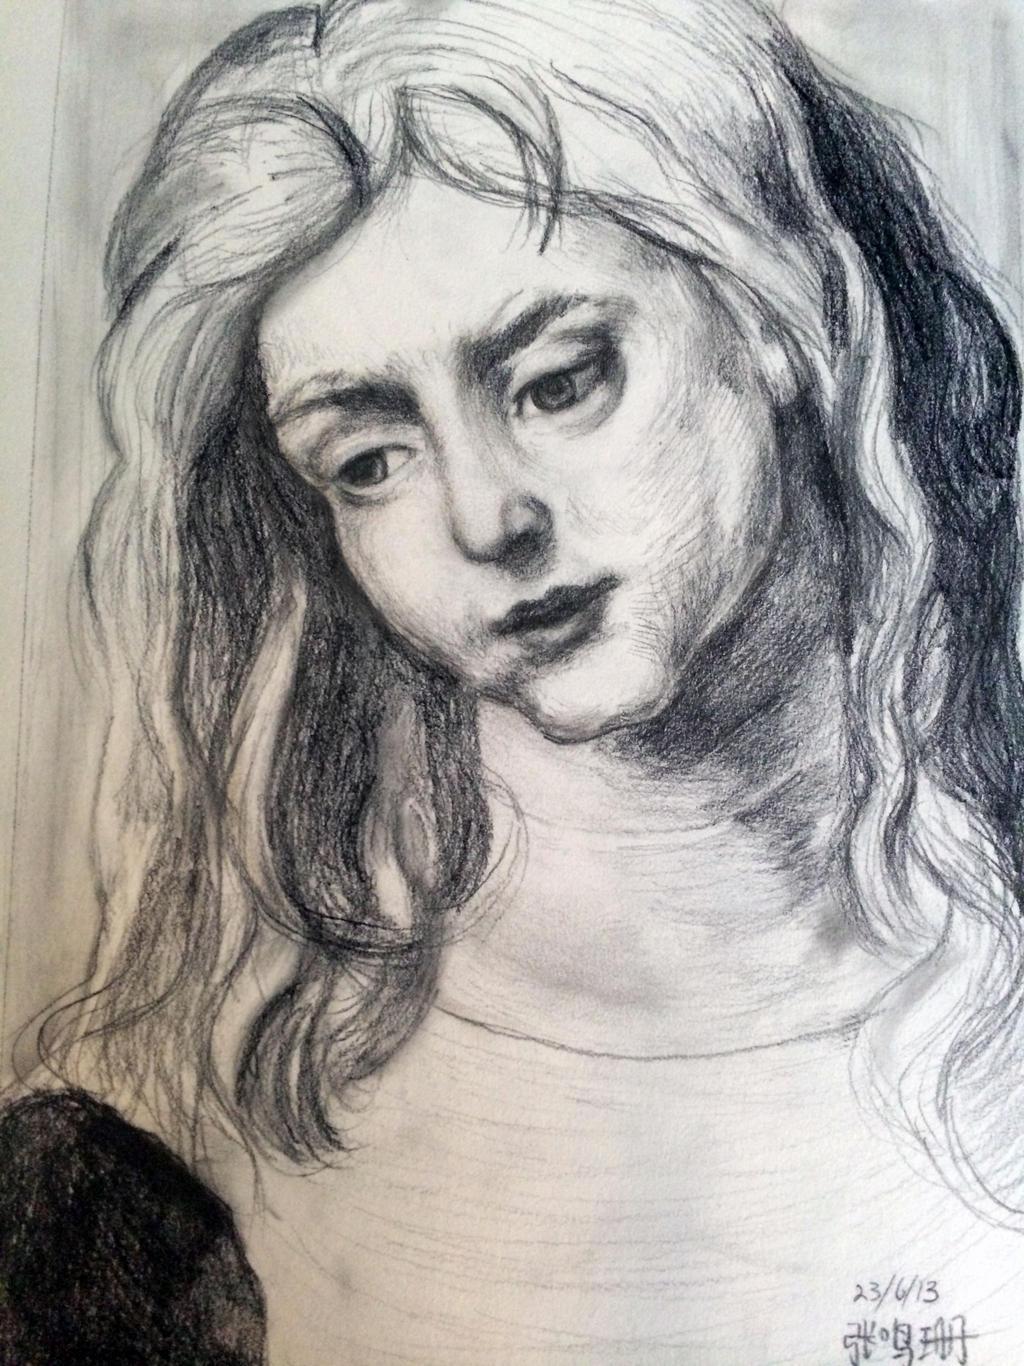 Man Sketch by senpaiiii